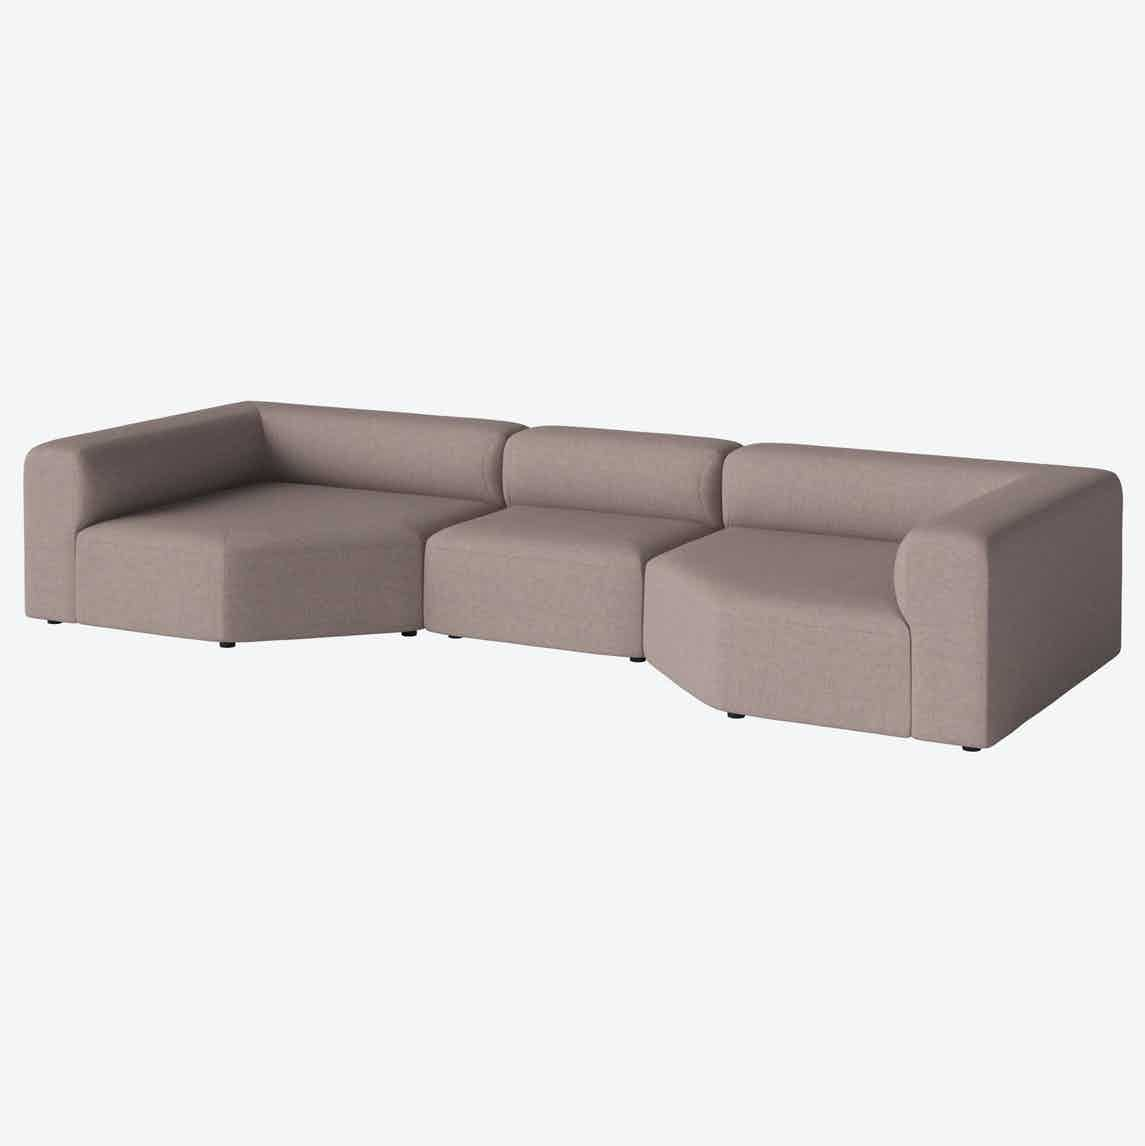 Bolia angle modular sofa thumbnail haute living